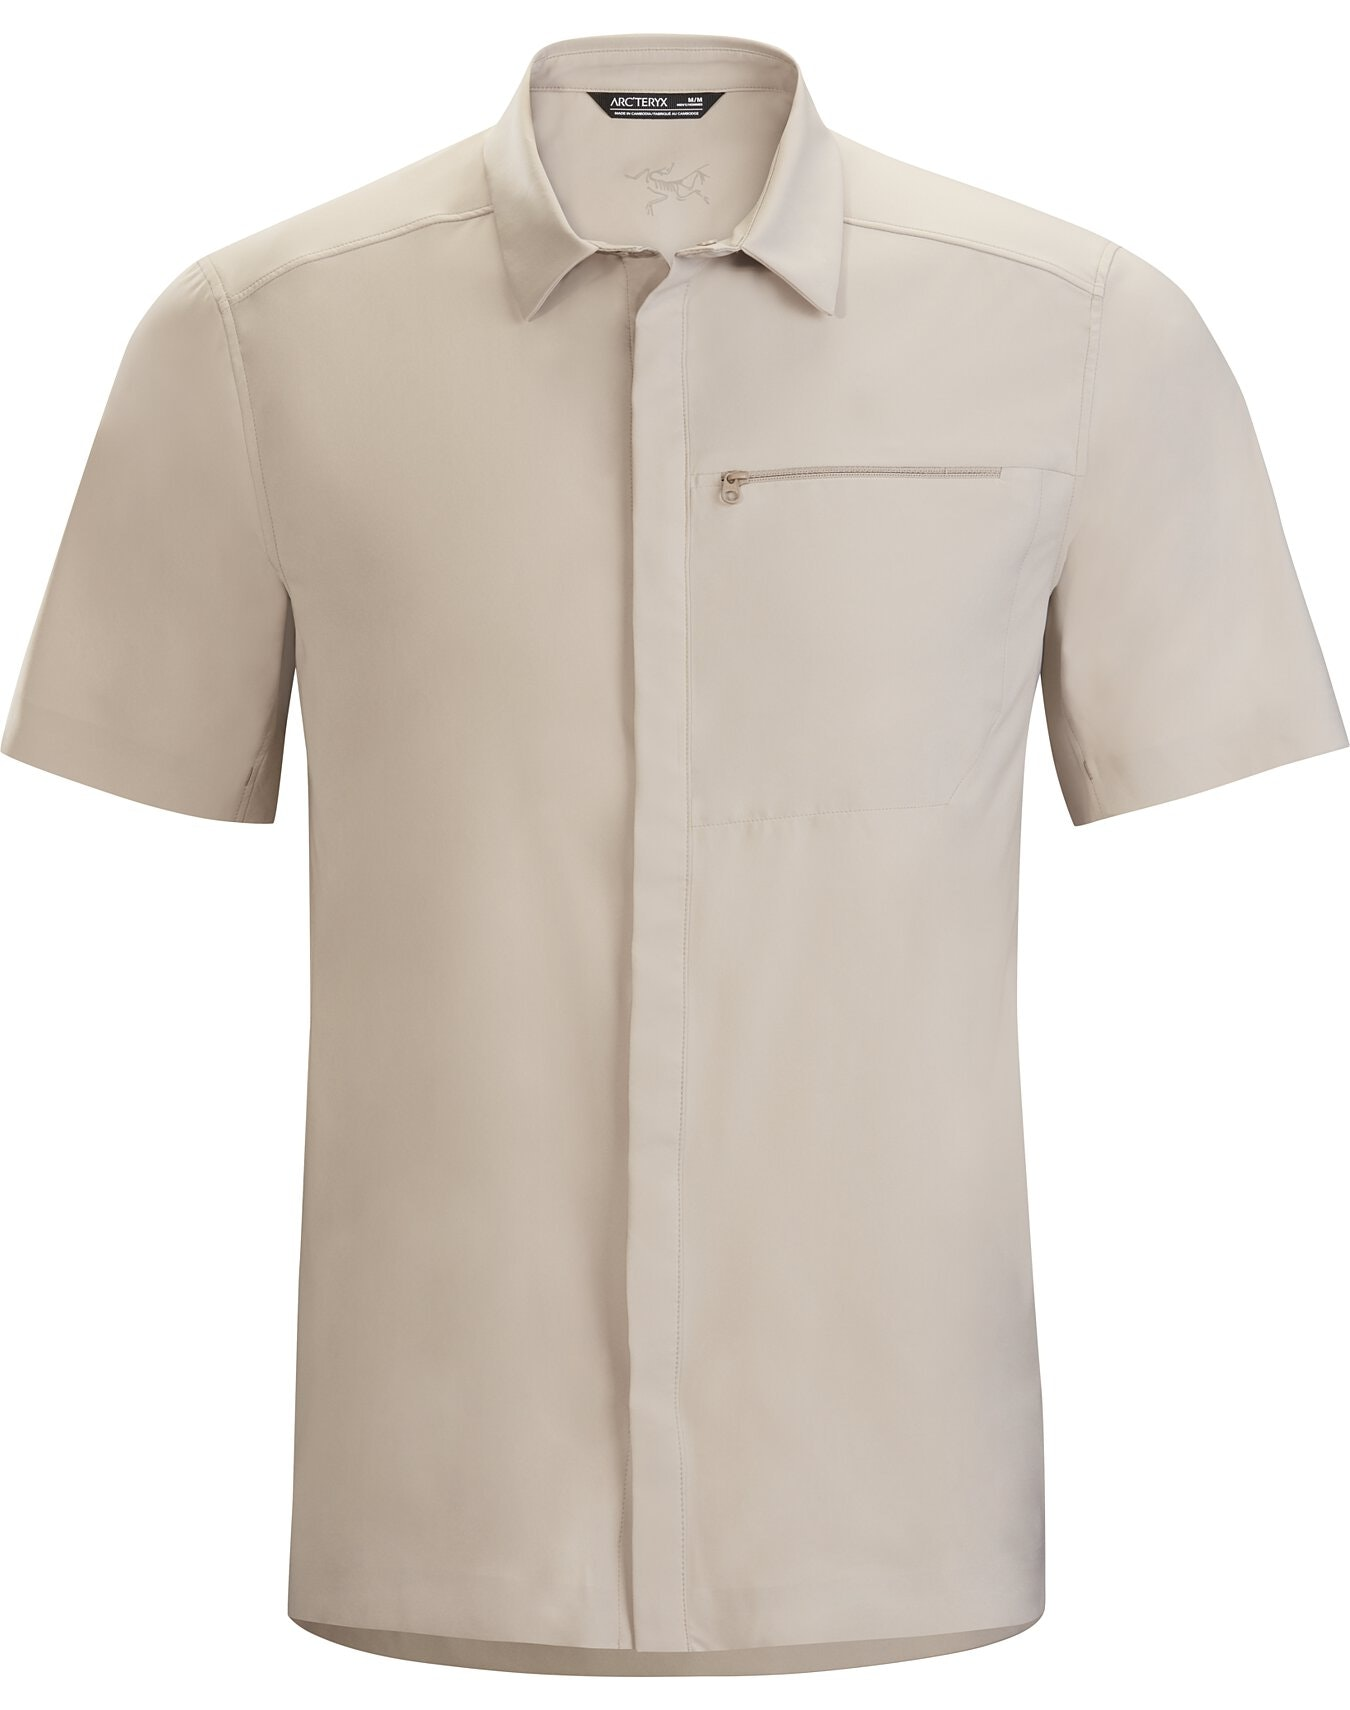 Skyline Shirt SS Rune